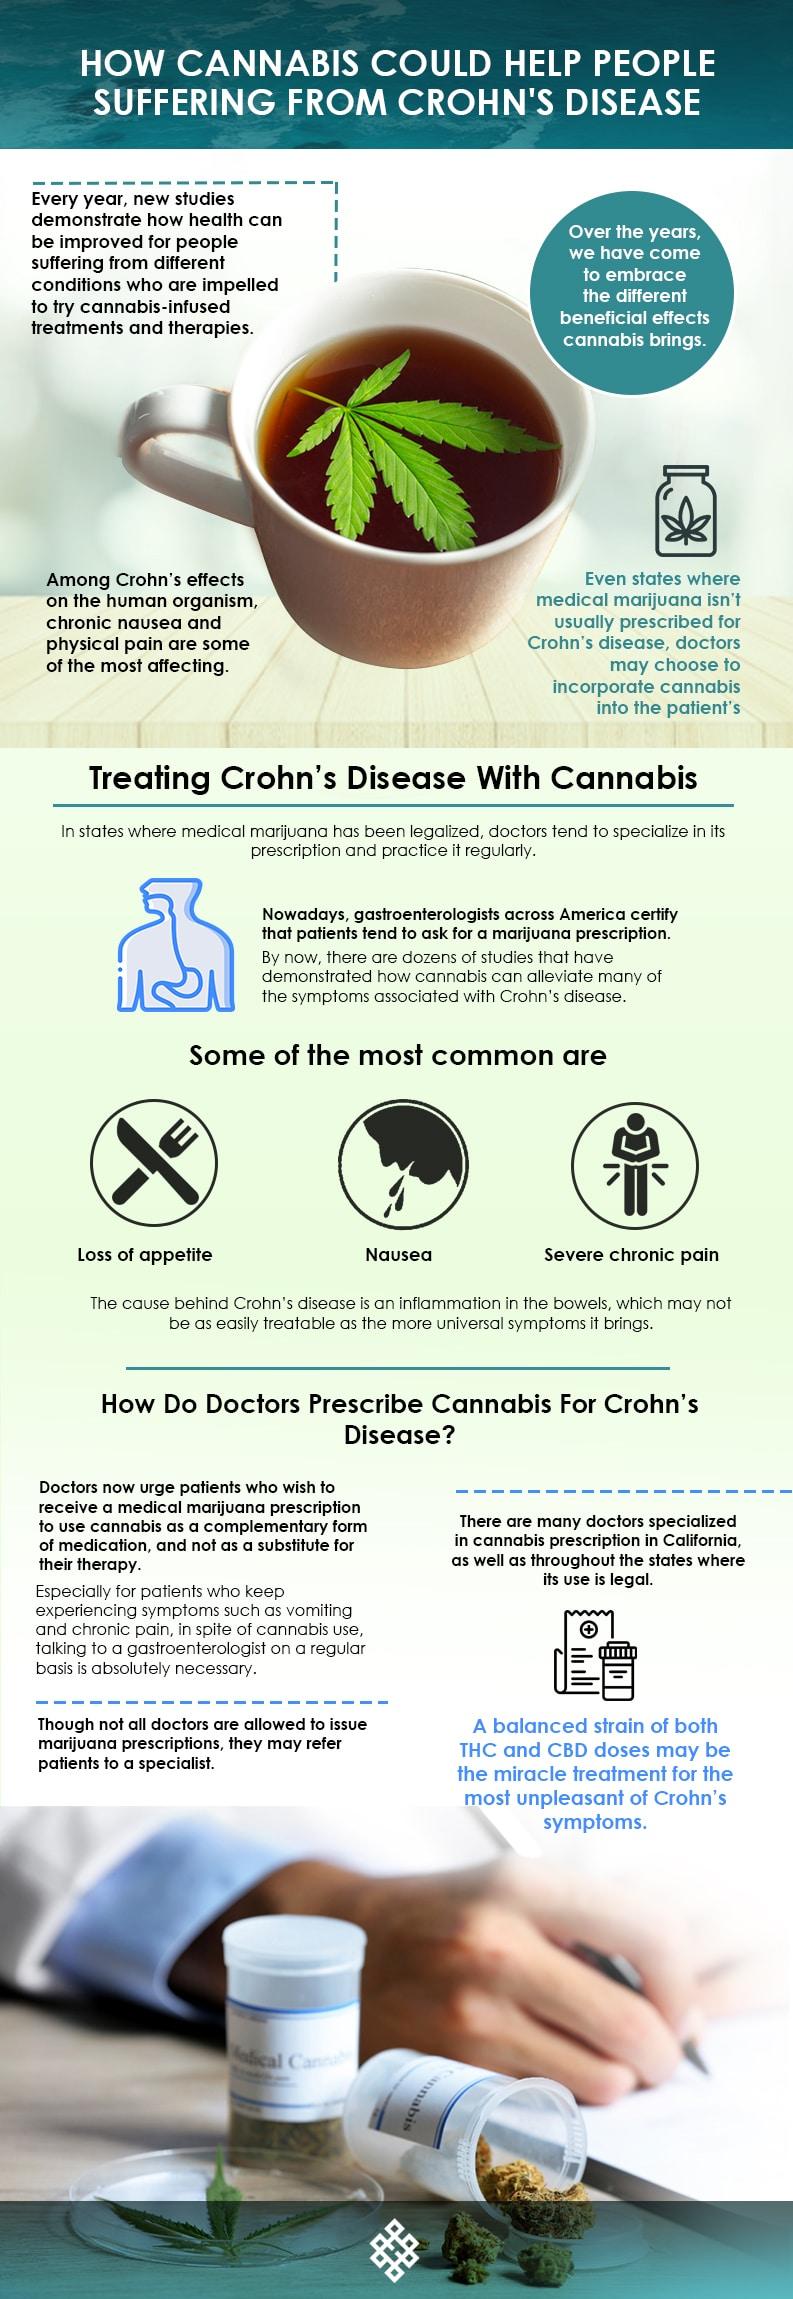 Crohn's Disease, How Cannabis Could Help People Suffering From Crohn's Disease